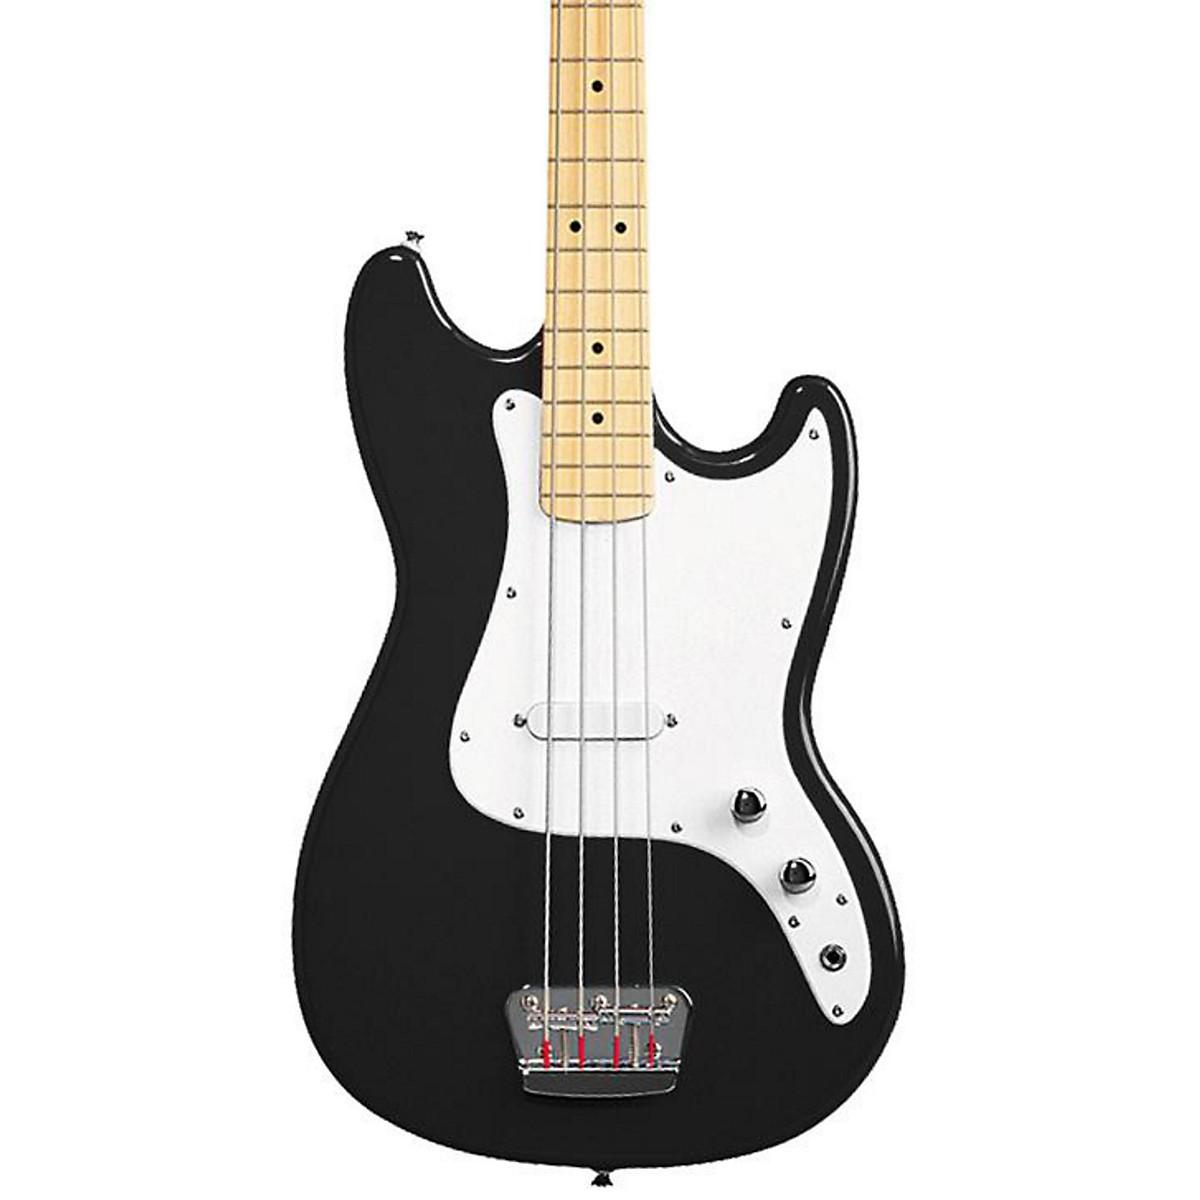 Squier Affinity Series Bronco Bass Guitar